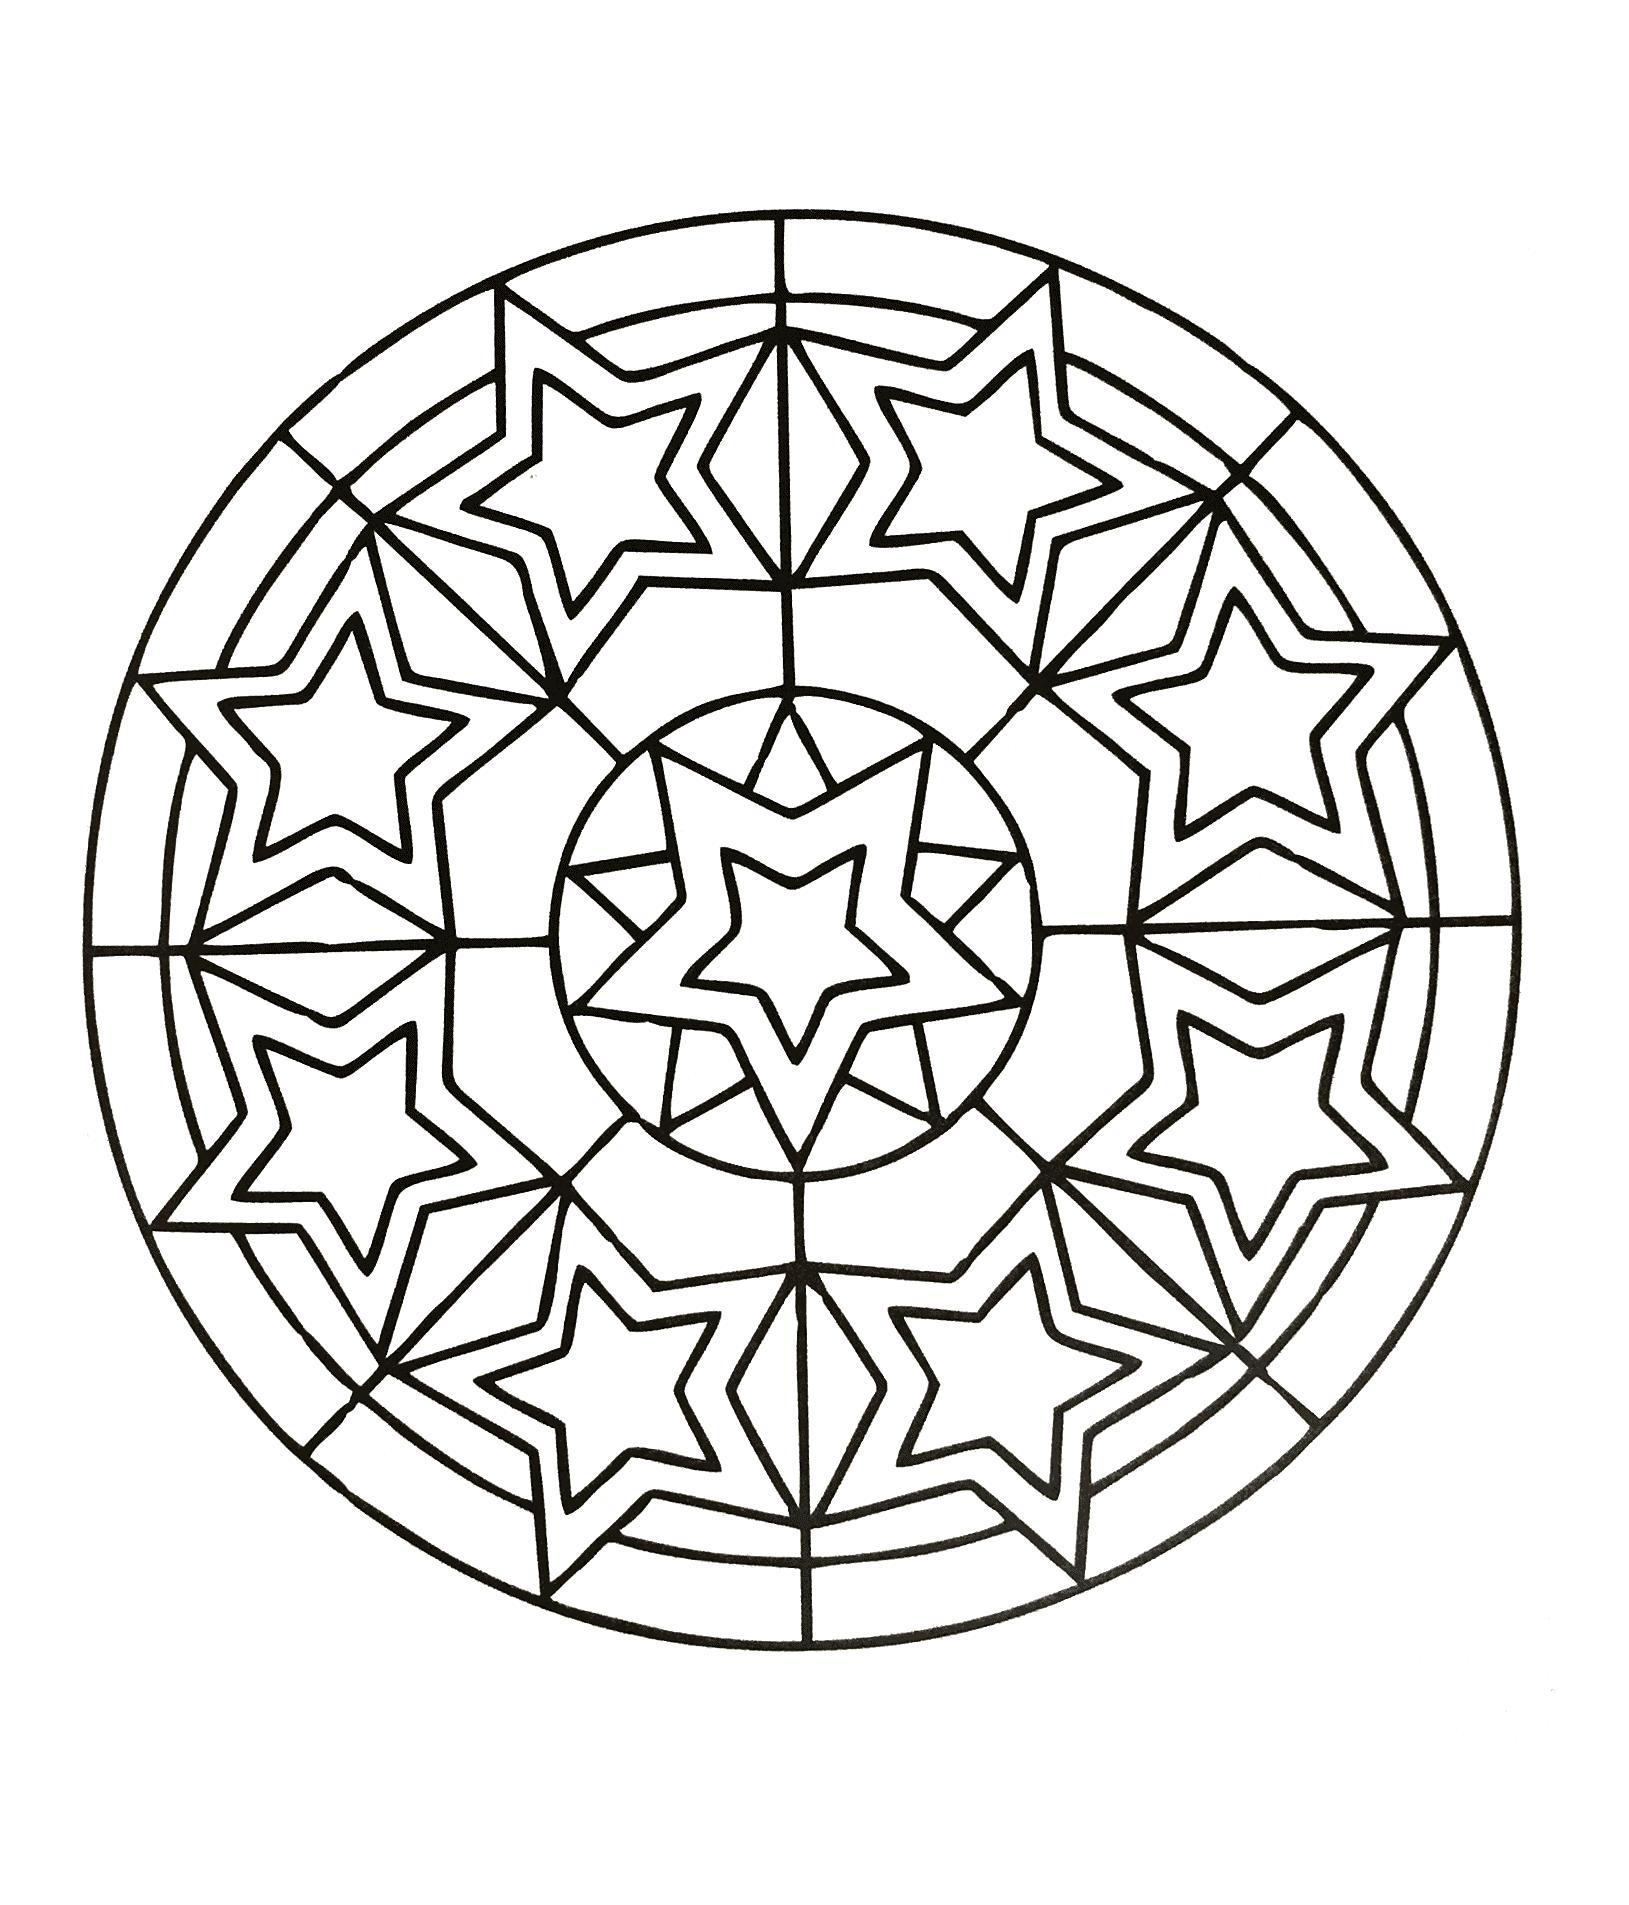 Mandala to download stars - Simple Mandalas - 100% Mandalas Zen ...